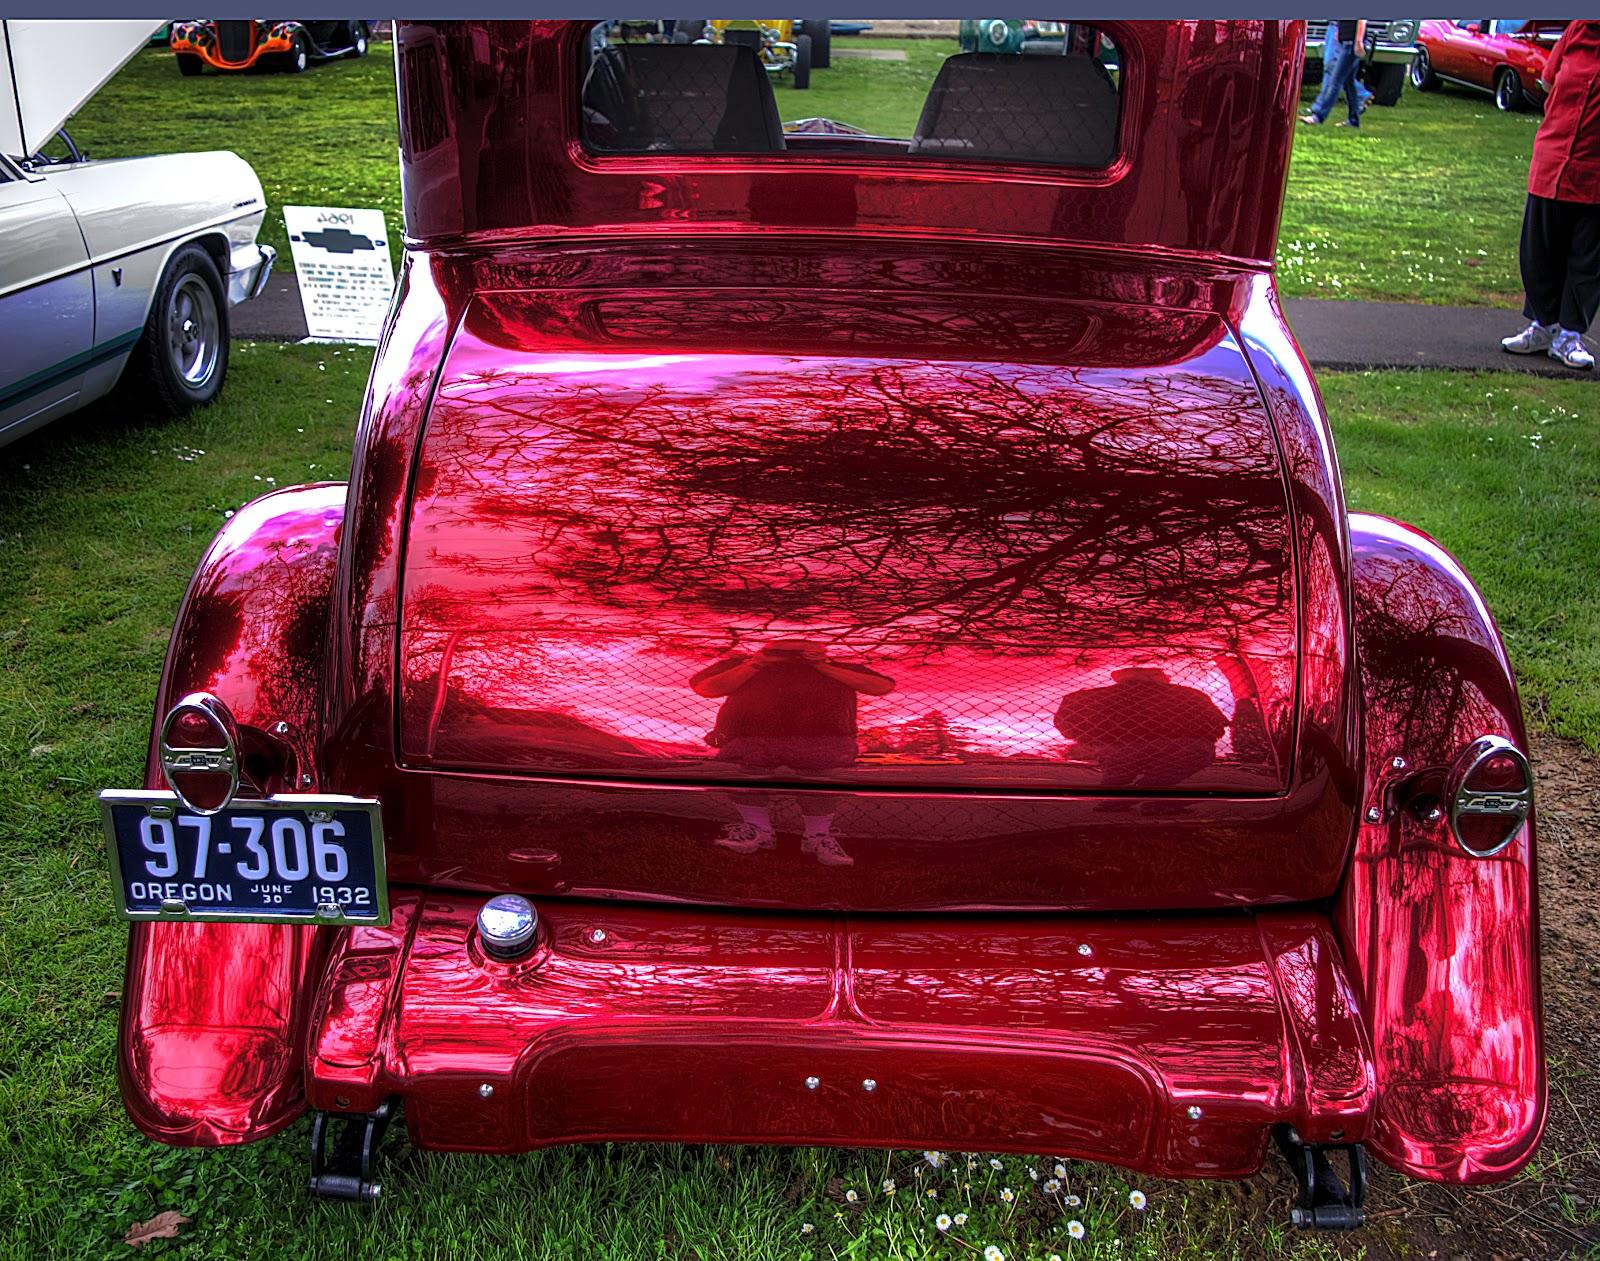 Thom Zehrfeld Photography : 1932 Chevy Deluxe Coupe